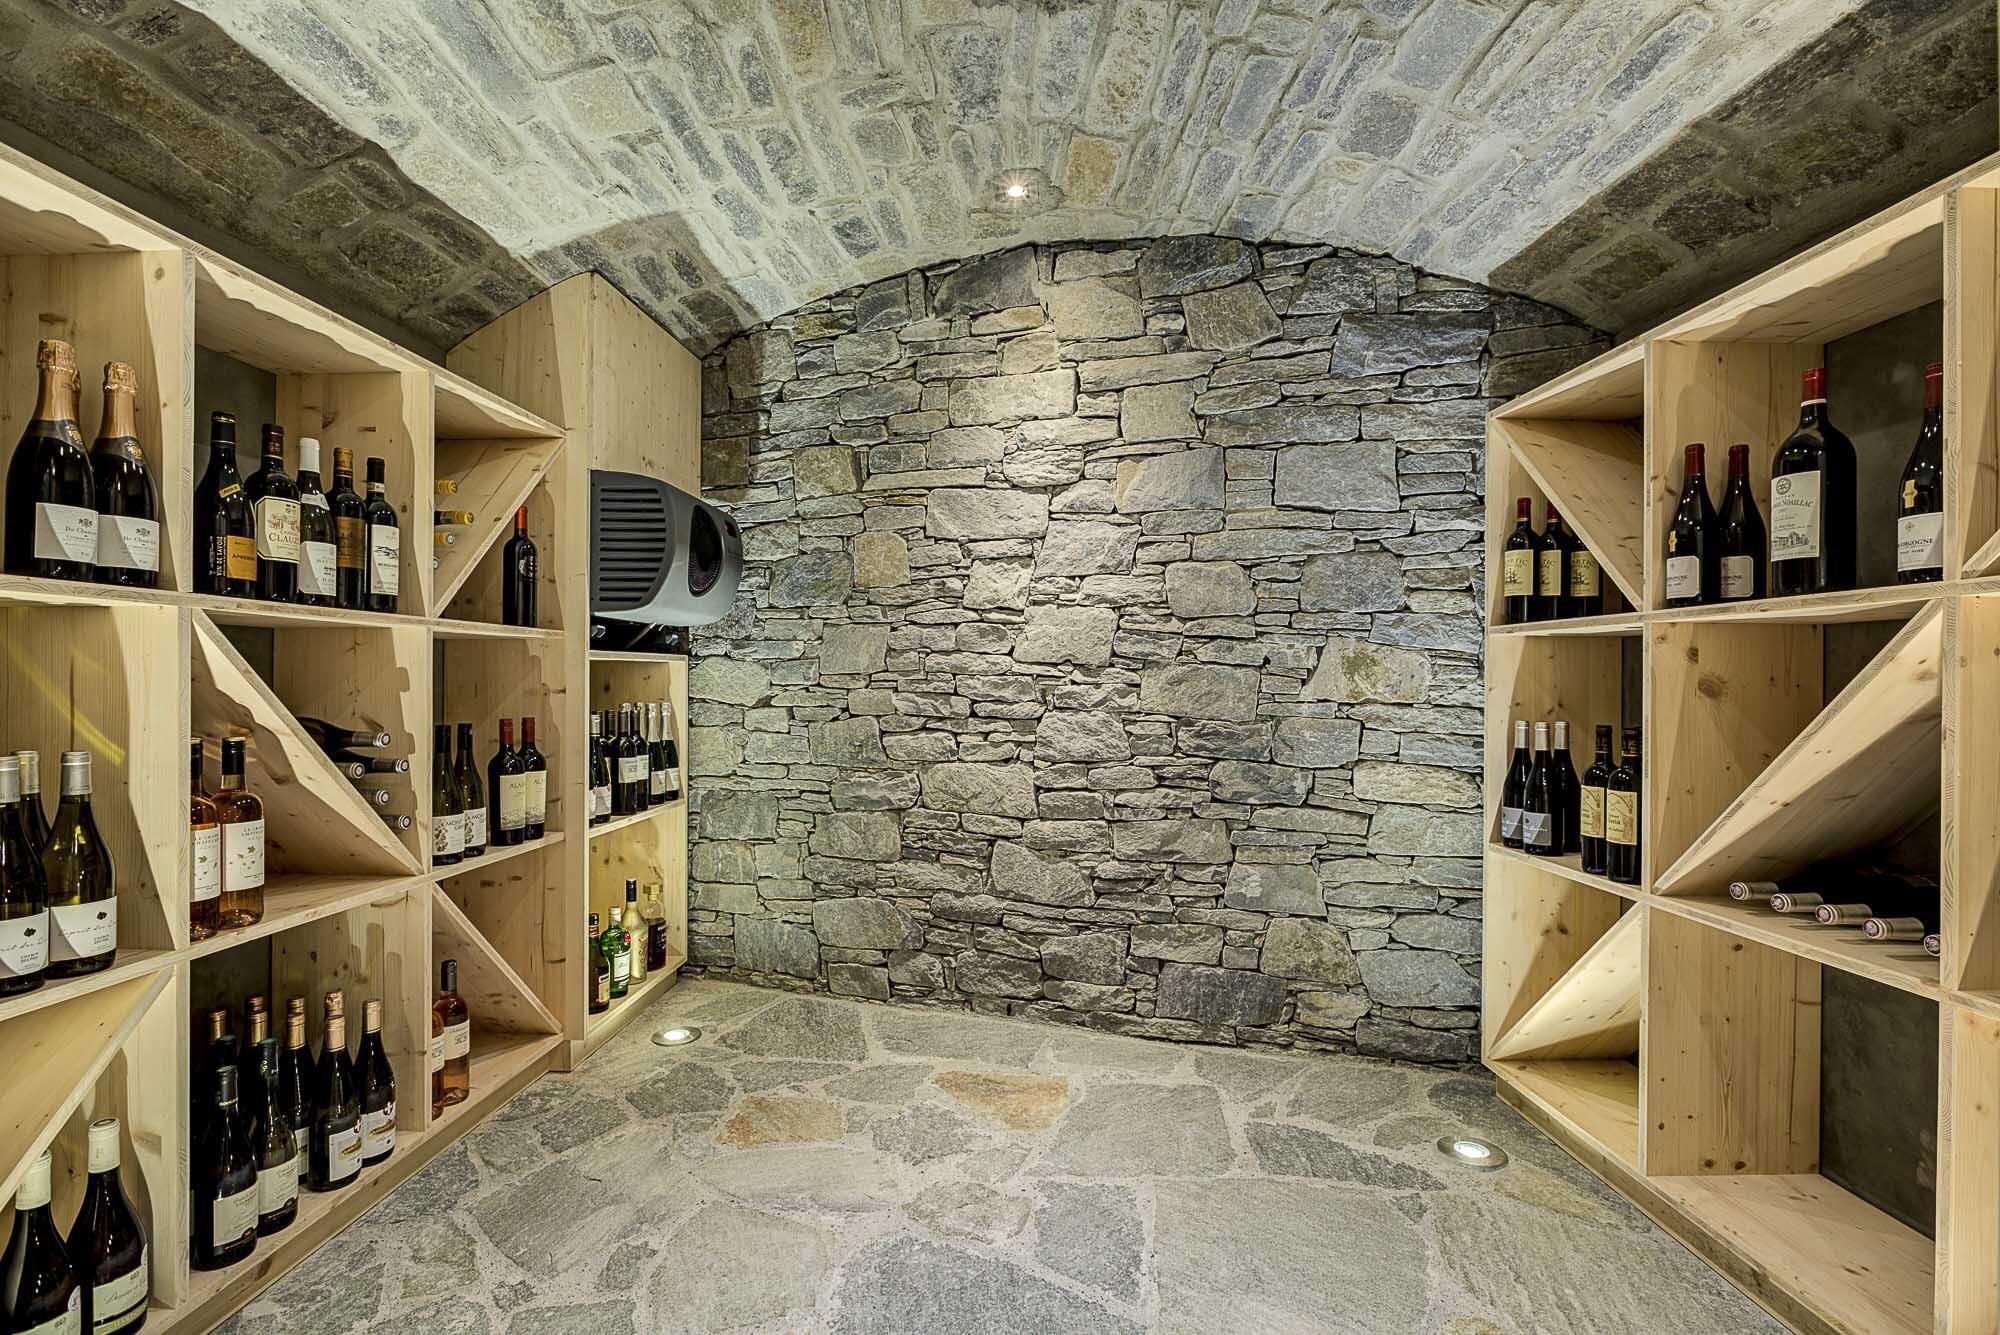 tg-ski-luxury-chalet-bouquetin-morzine-wine-cellar-025.jpg